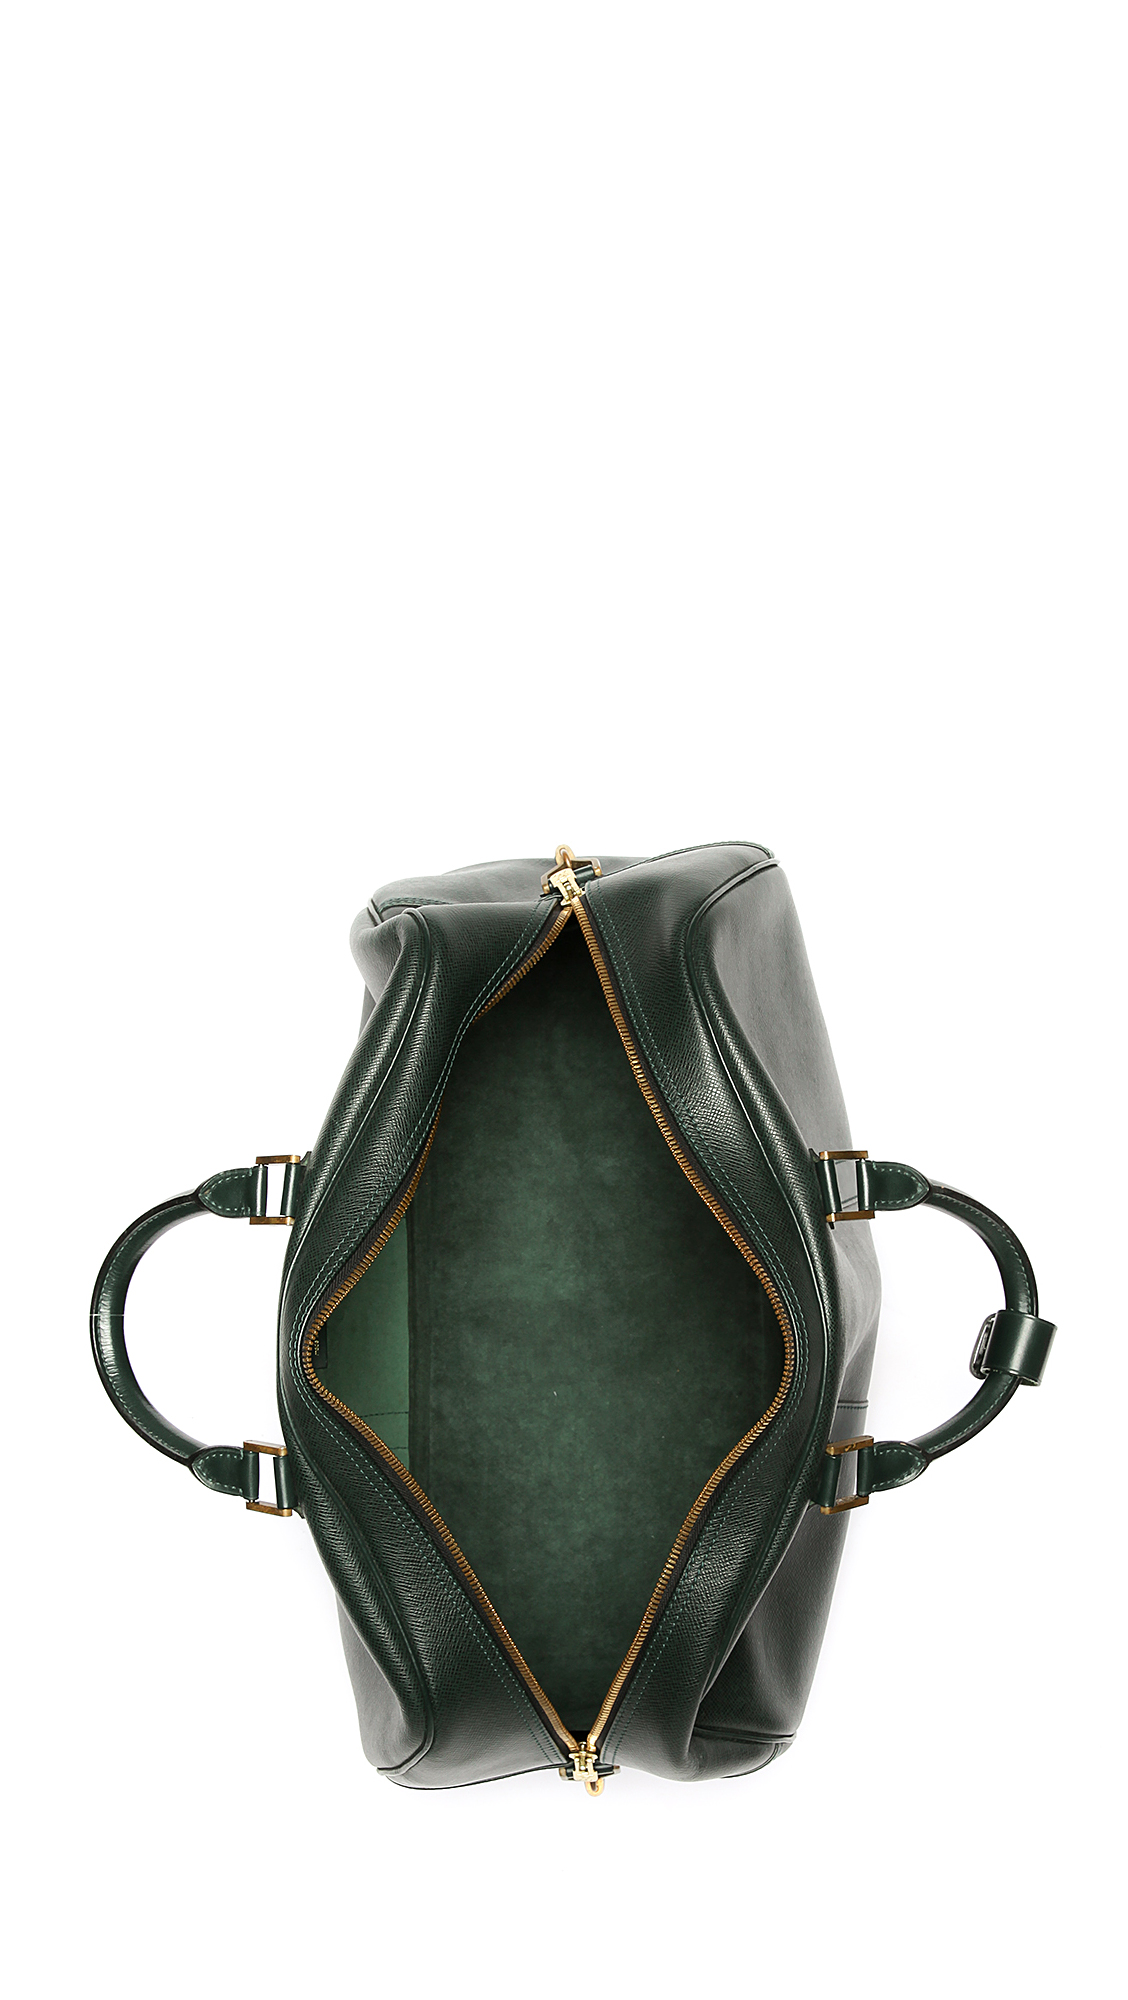 5e02fc712970 WGACA Vintage Vintage Louis Vuitton Taiga Keepall Bag